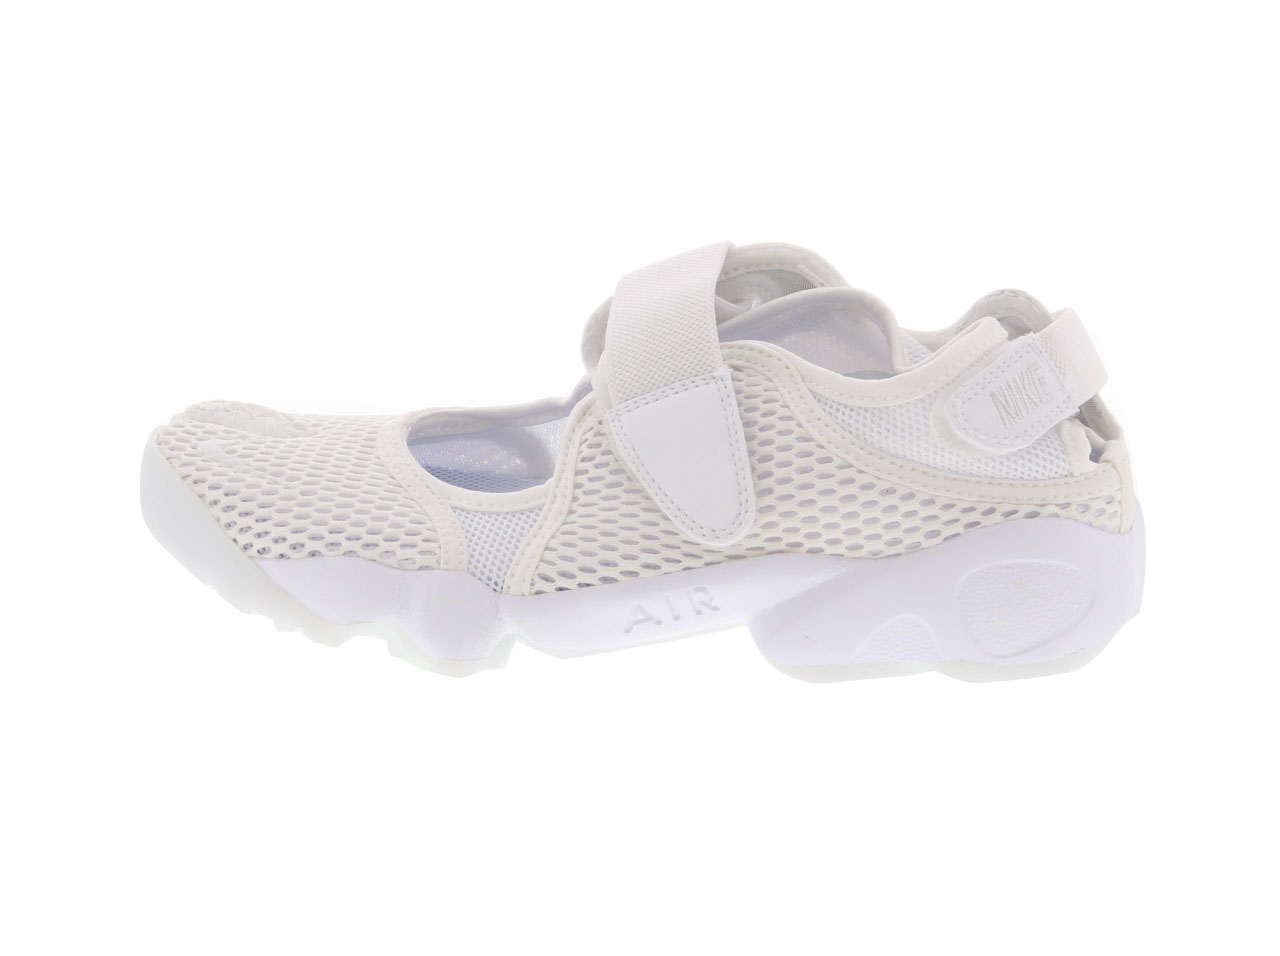 NIKE WOMENS AIR RIFT BLEASE(848386-100)【ナイキ ウィメンズ エアリフト ブリーズ】【レディースファッション】【シューズ】【スニーカー】【靴】【フットウェア】